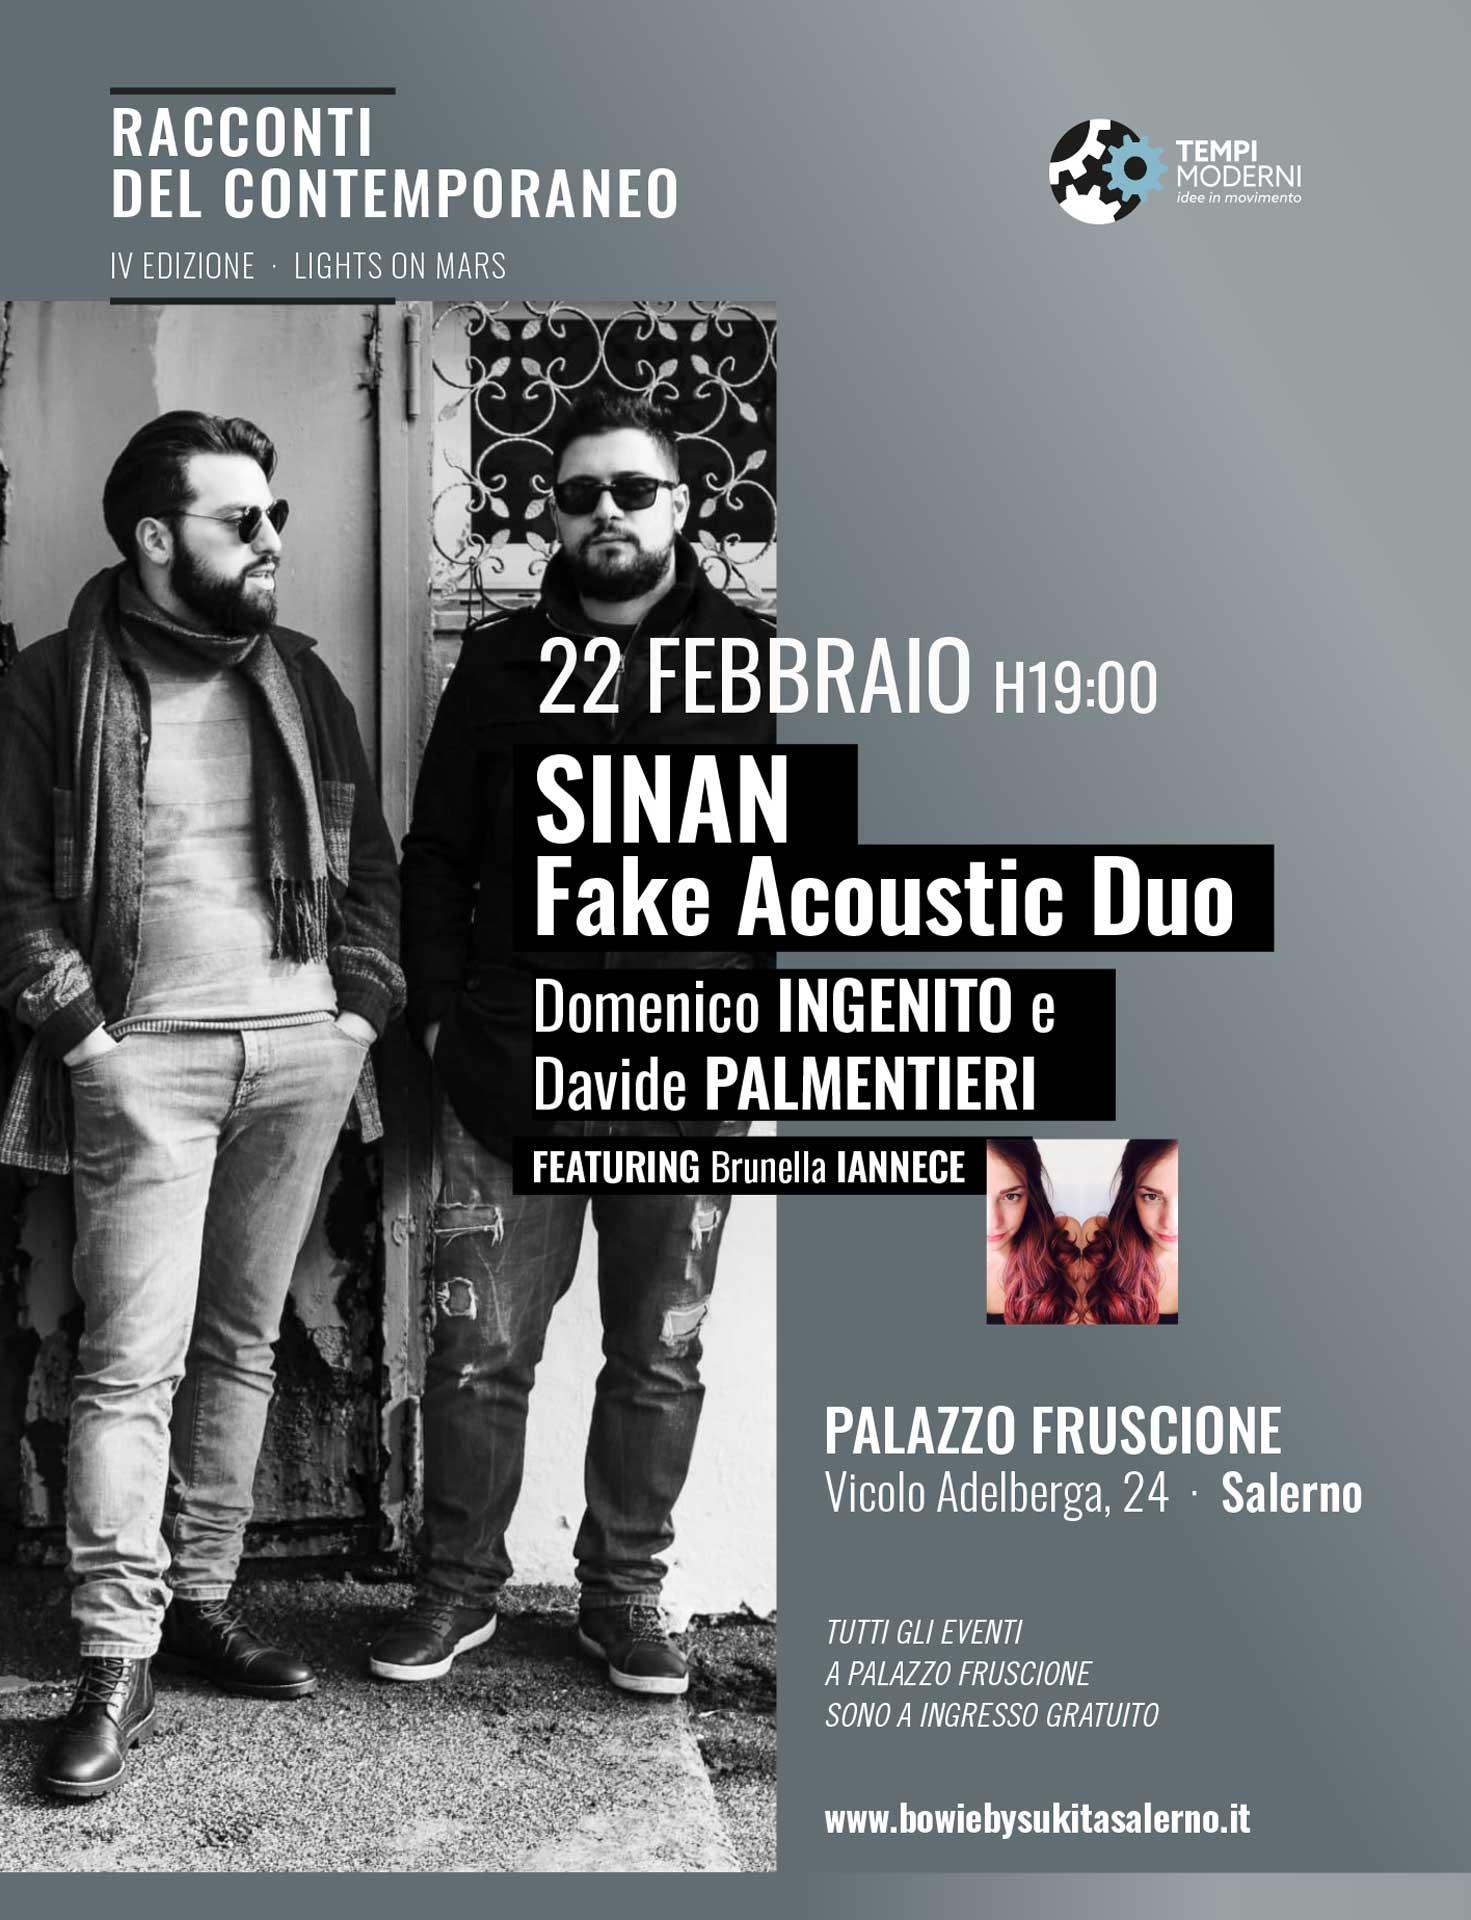 Locandina 22 Febbraio 2020 SINAN Fake acoustic Duo